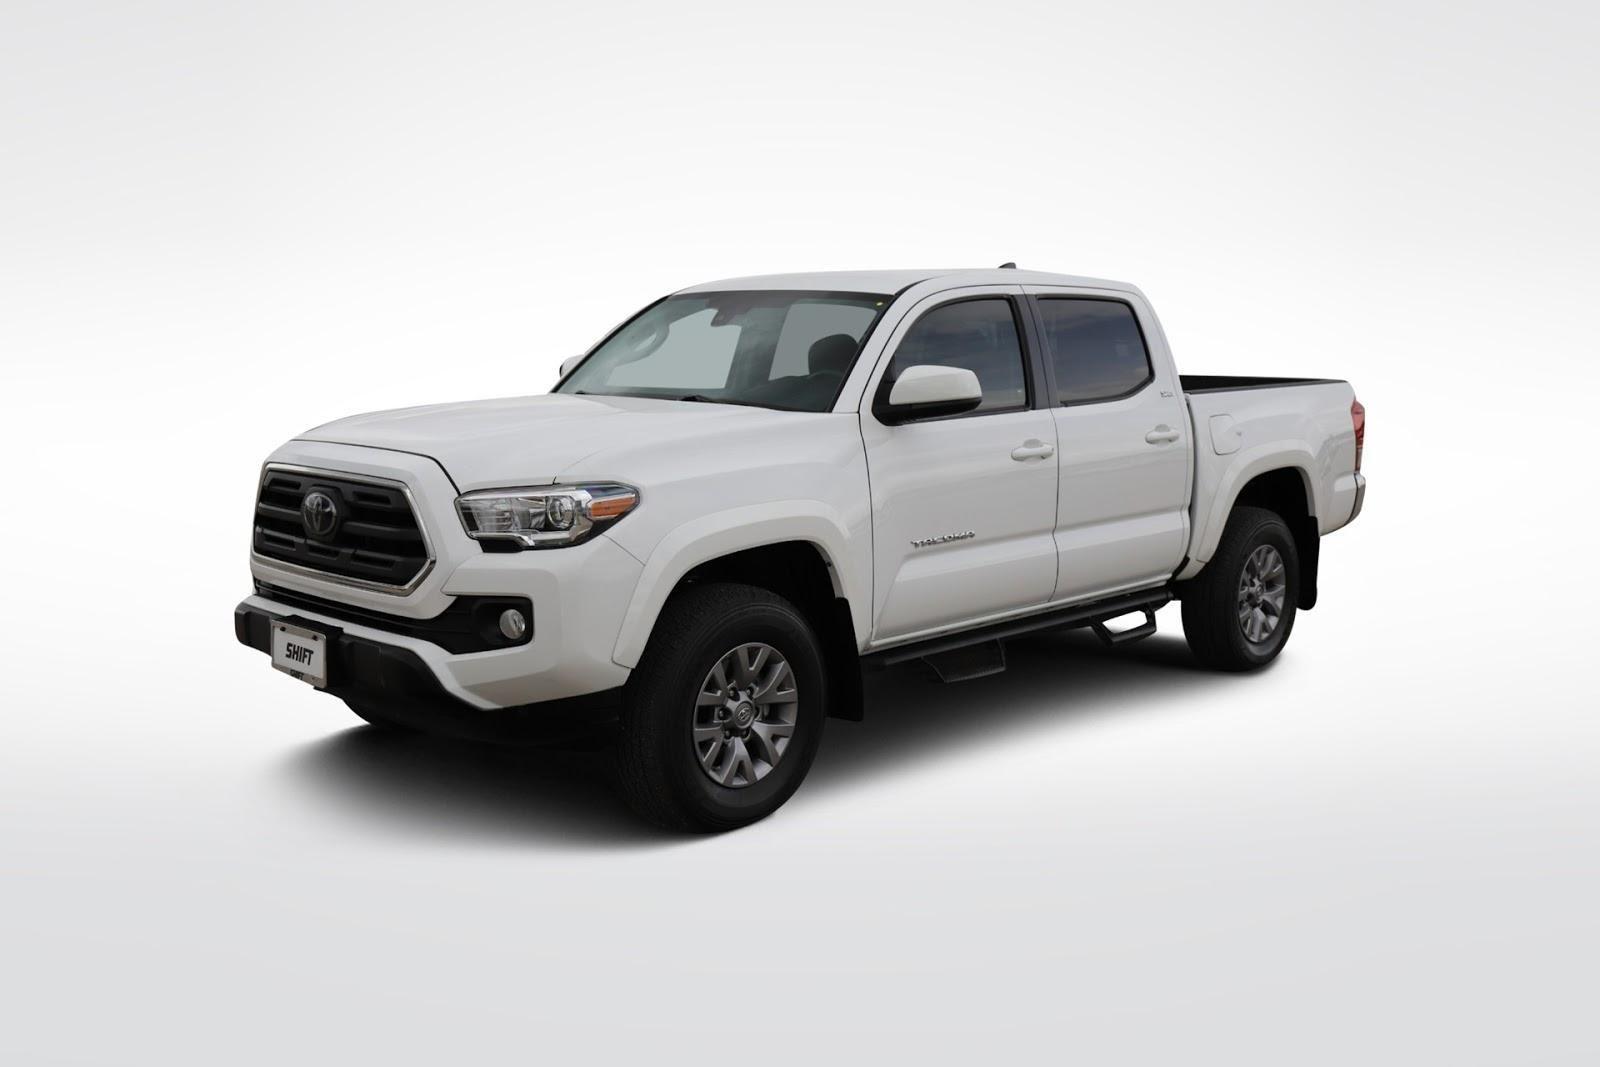 2018 Toyota Tacoma (from $34,950)